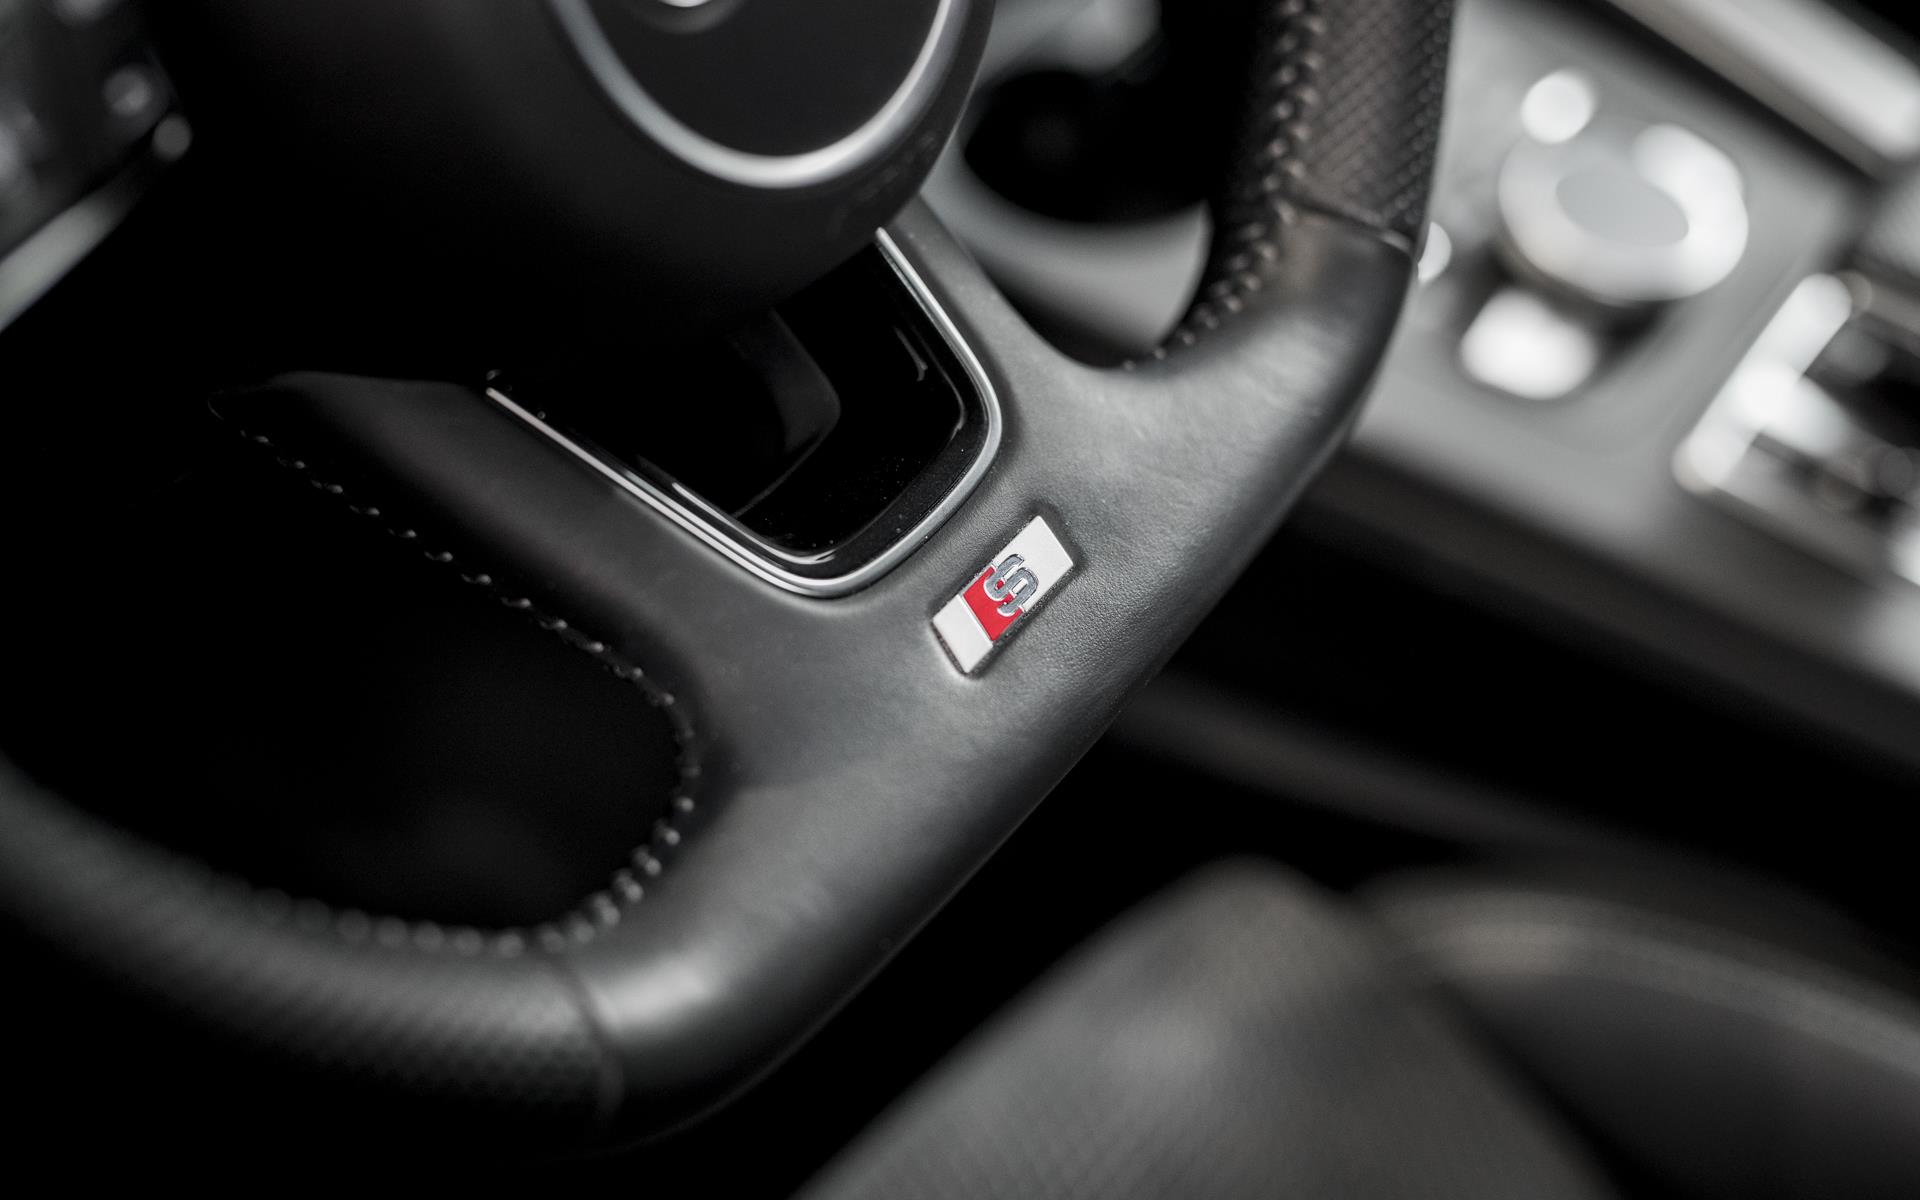 Avant 2,0 TDI S-Line Black Edition TipTronic 190HK Stc  image7